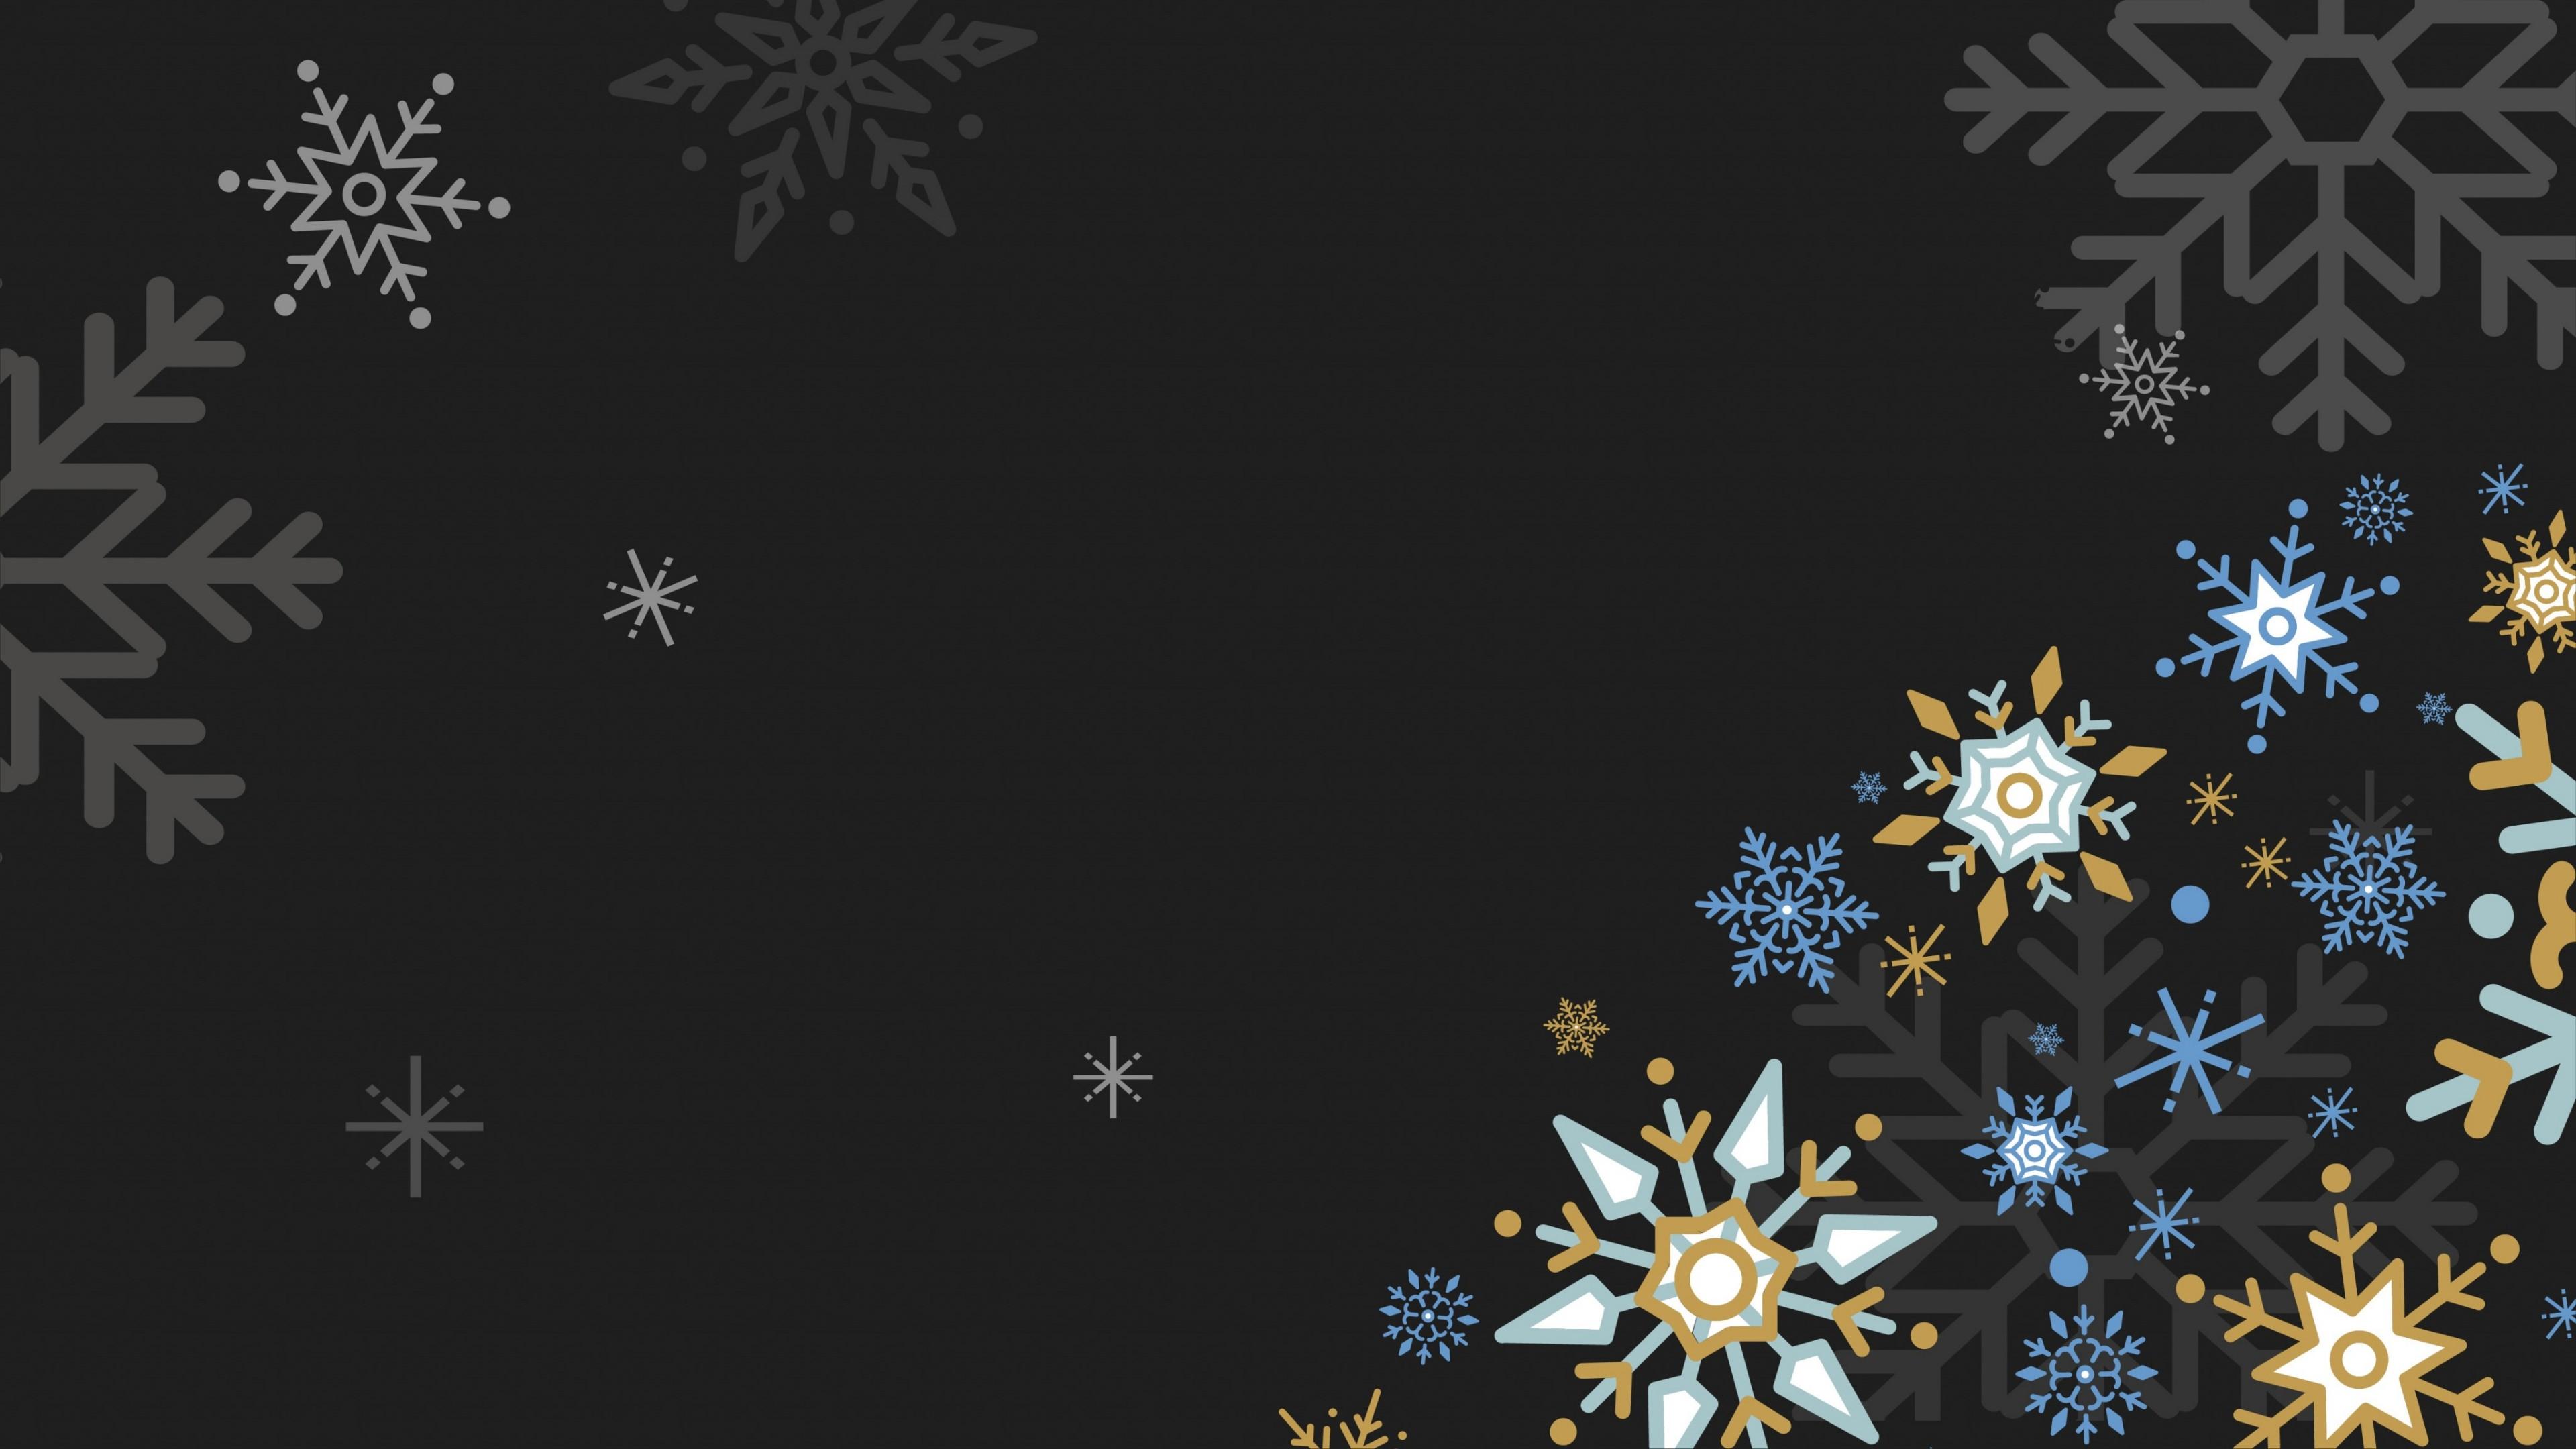 Snowflakes on dark background wallpaper